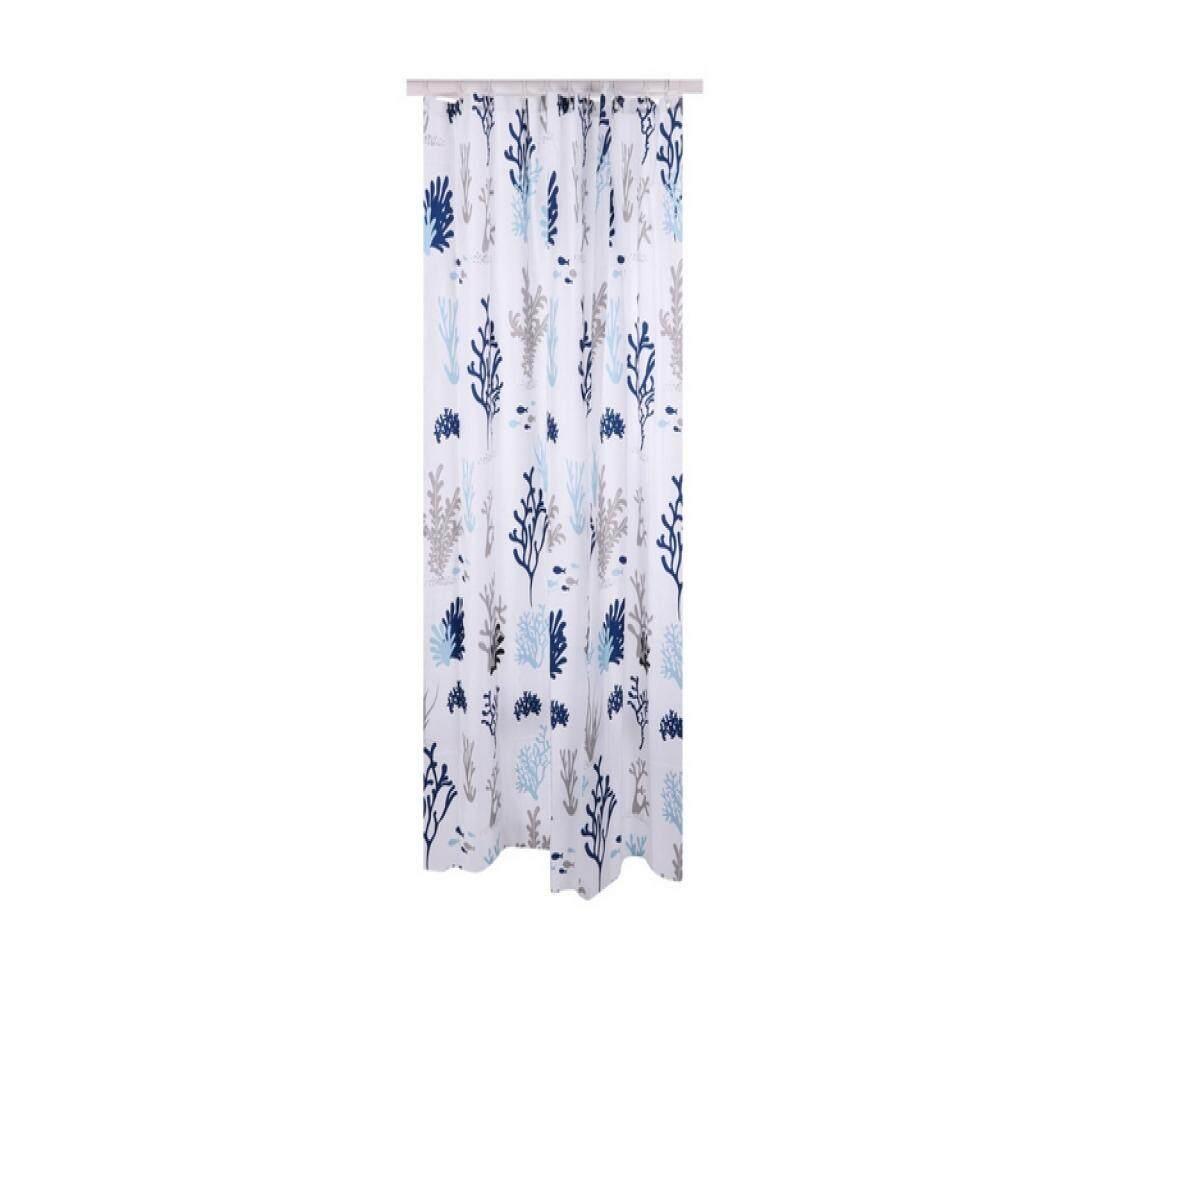 Shower Curtain Cm ม่านห้องน้ำ Poly Moya Acs17020 180x180 ซม. By The Eight Shop.